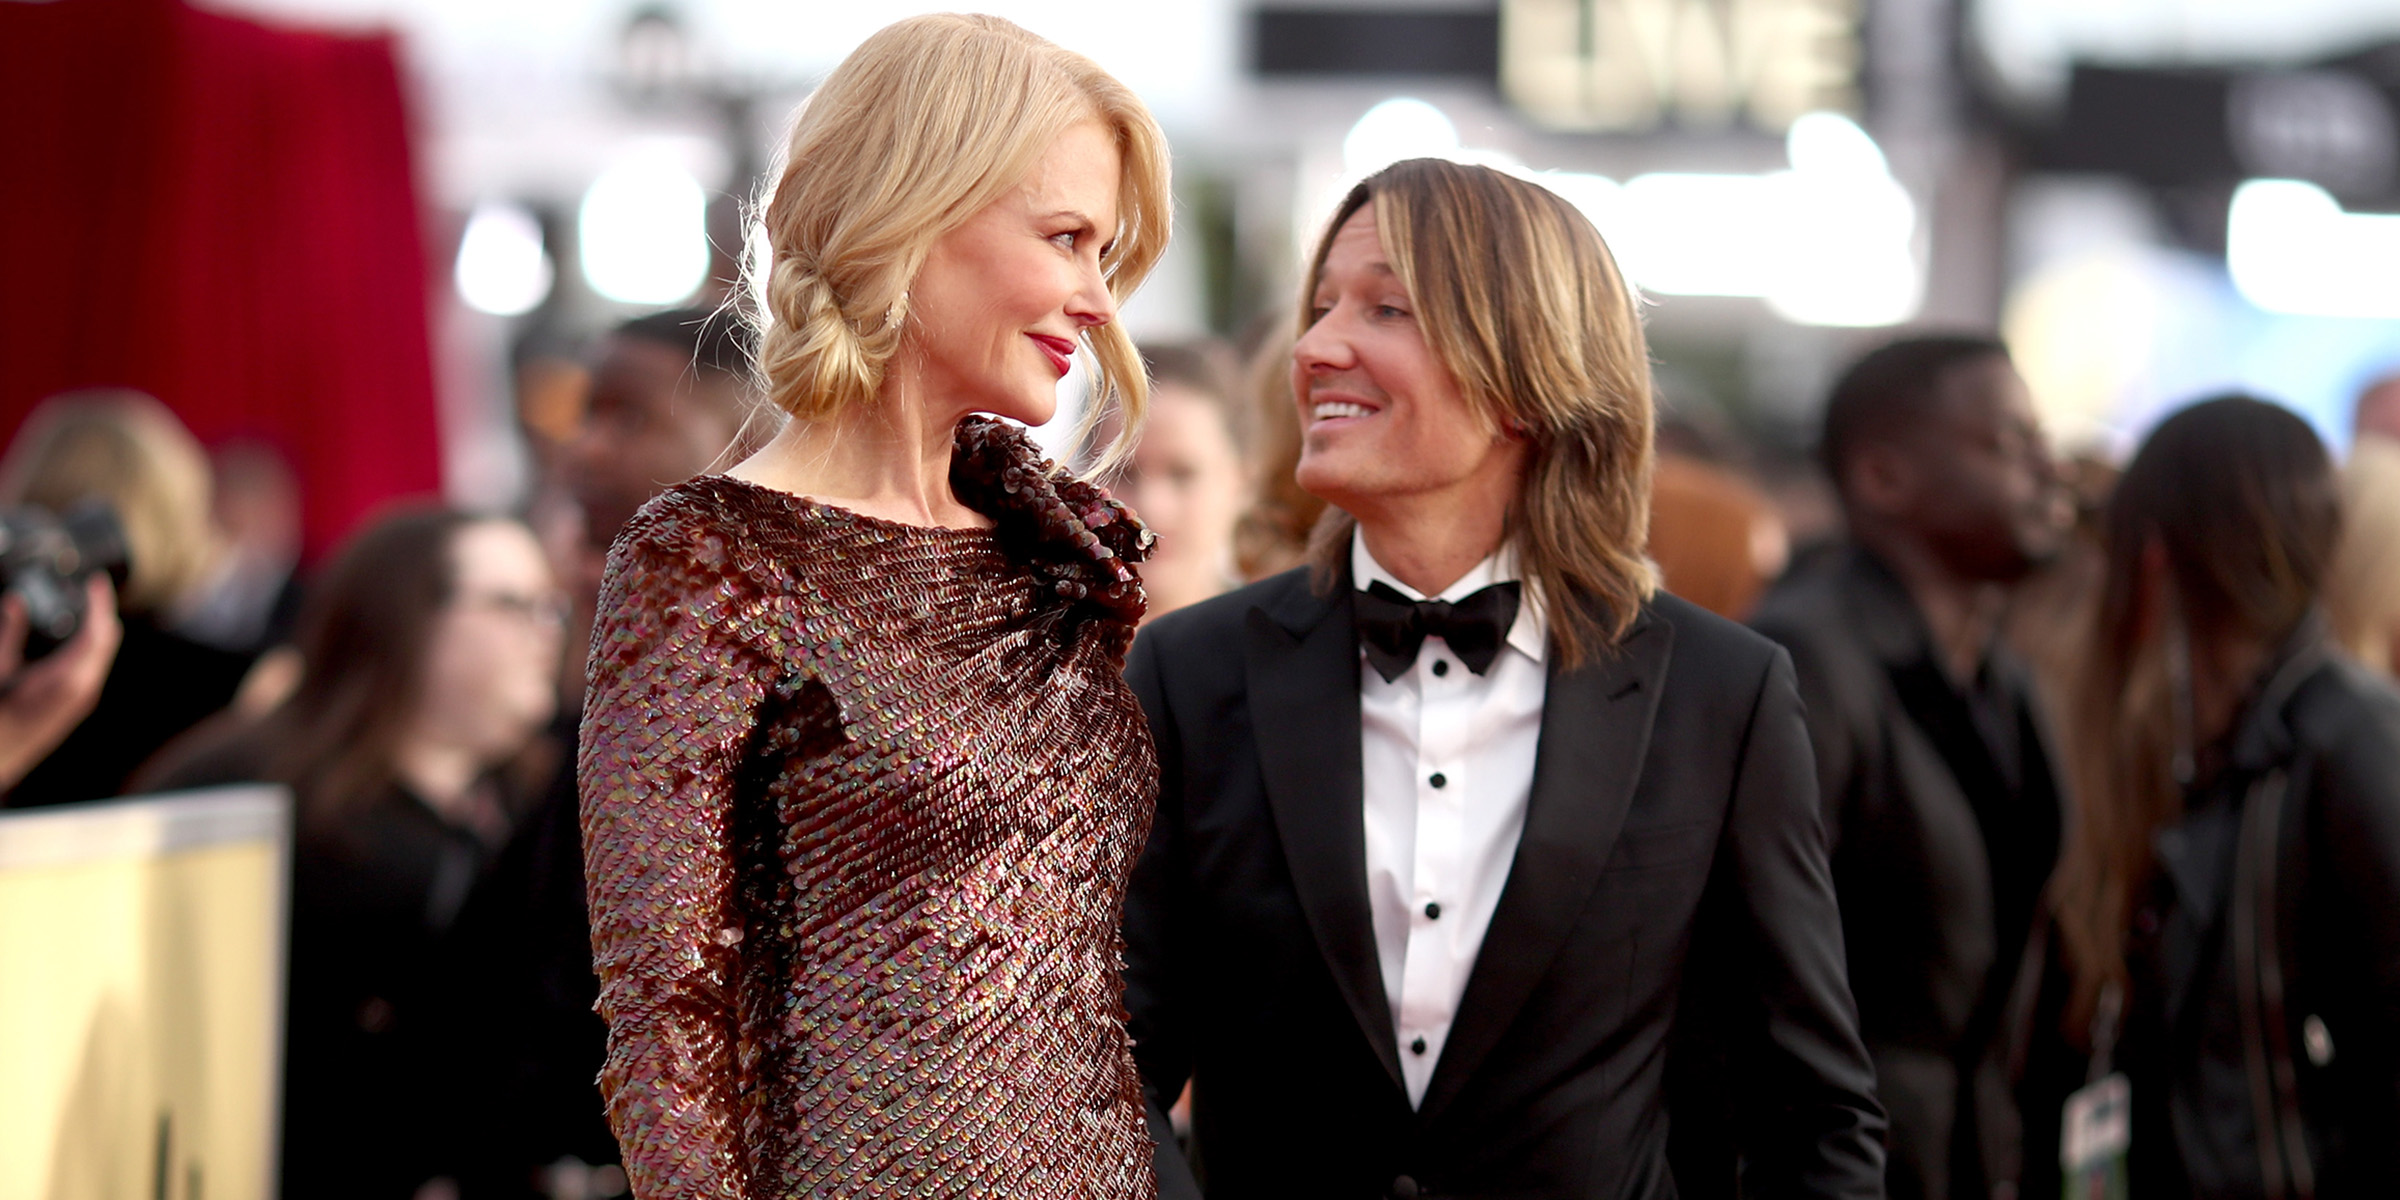 Keith Urban on when he knew wife Nicole Kidman was the one